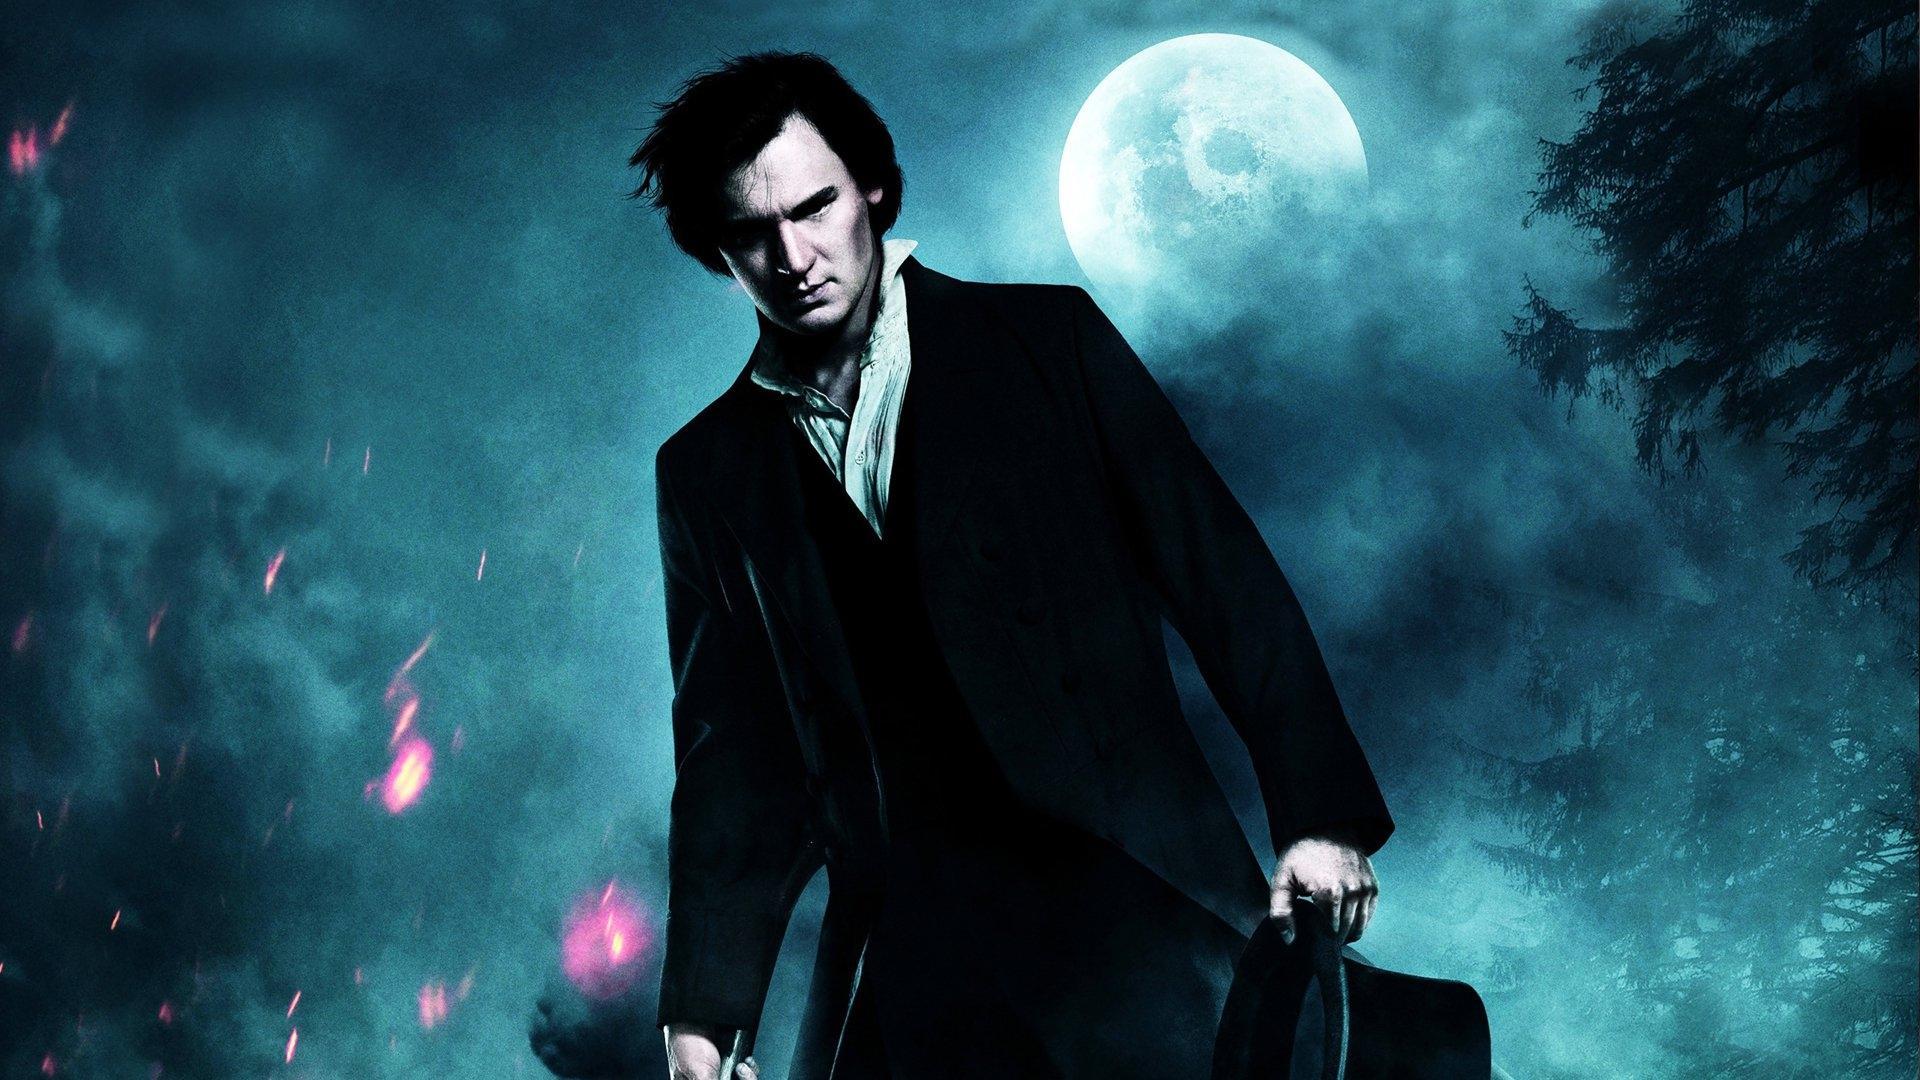 Abraham Lincoln Vampire Hunter Wallpaper HD Download 1920x1080